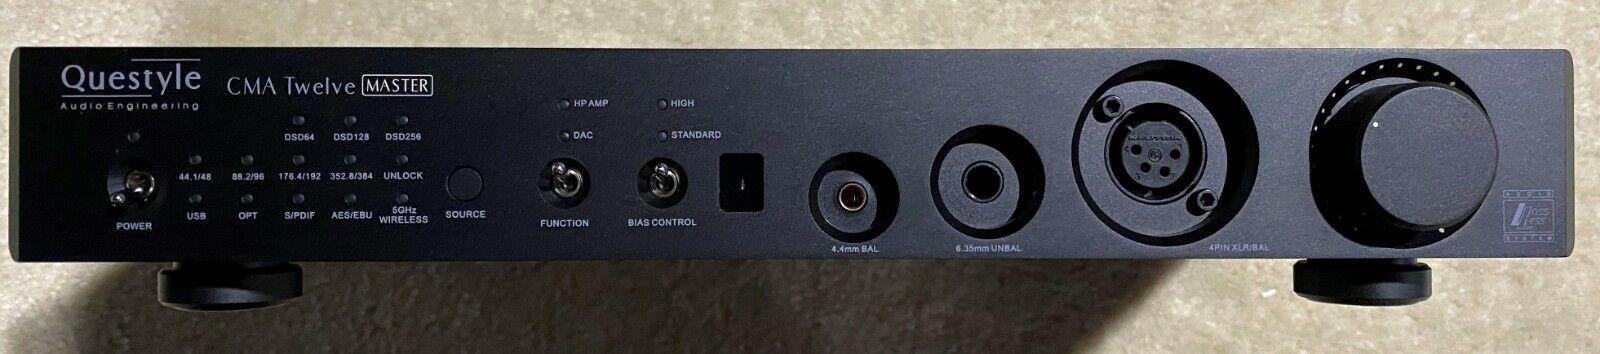 Questyle CMA 12 Master DAC/Headphone Amp